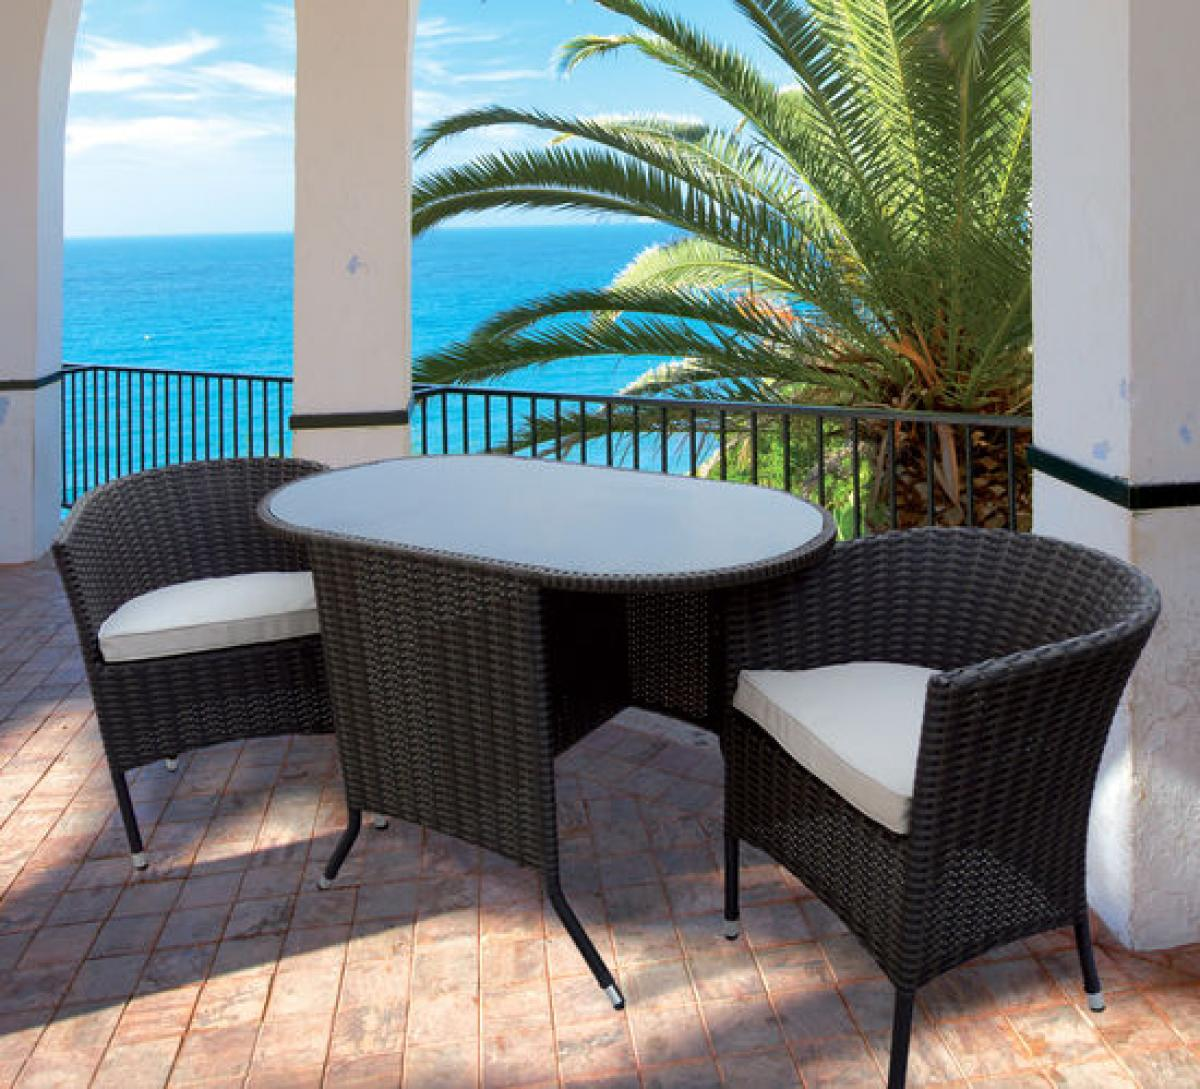 preissturz rattan garnitur sitzgruppe elena f r balkon. Black Bedroom Furniture Sets. Home Design Ideas